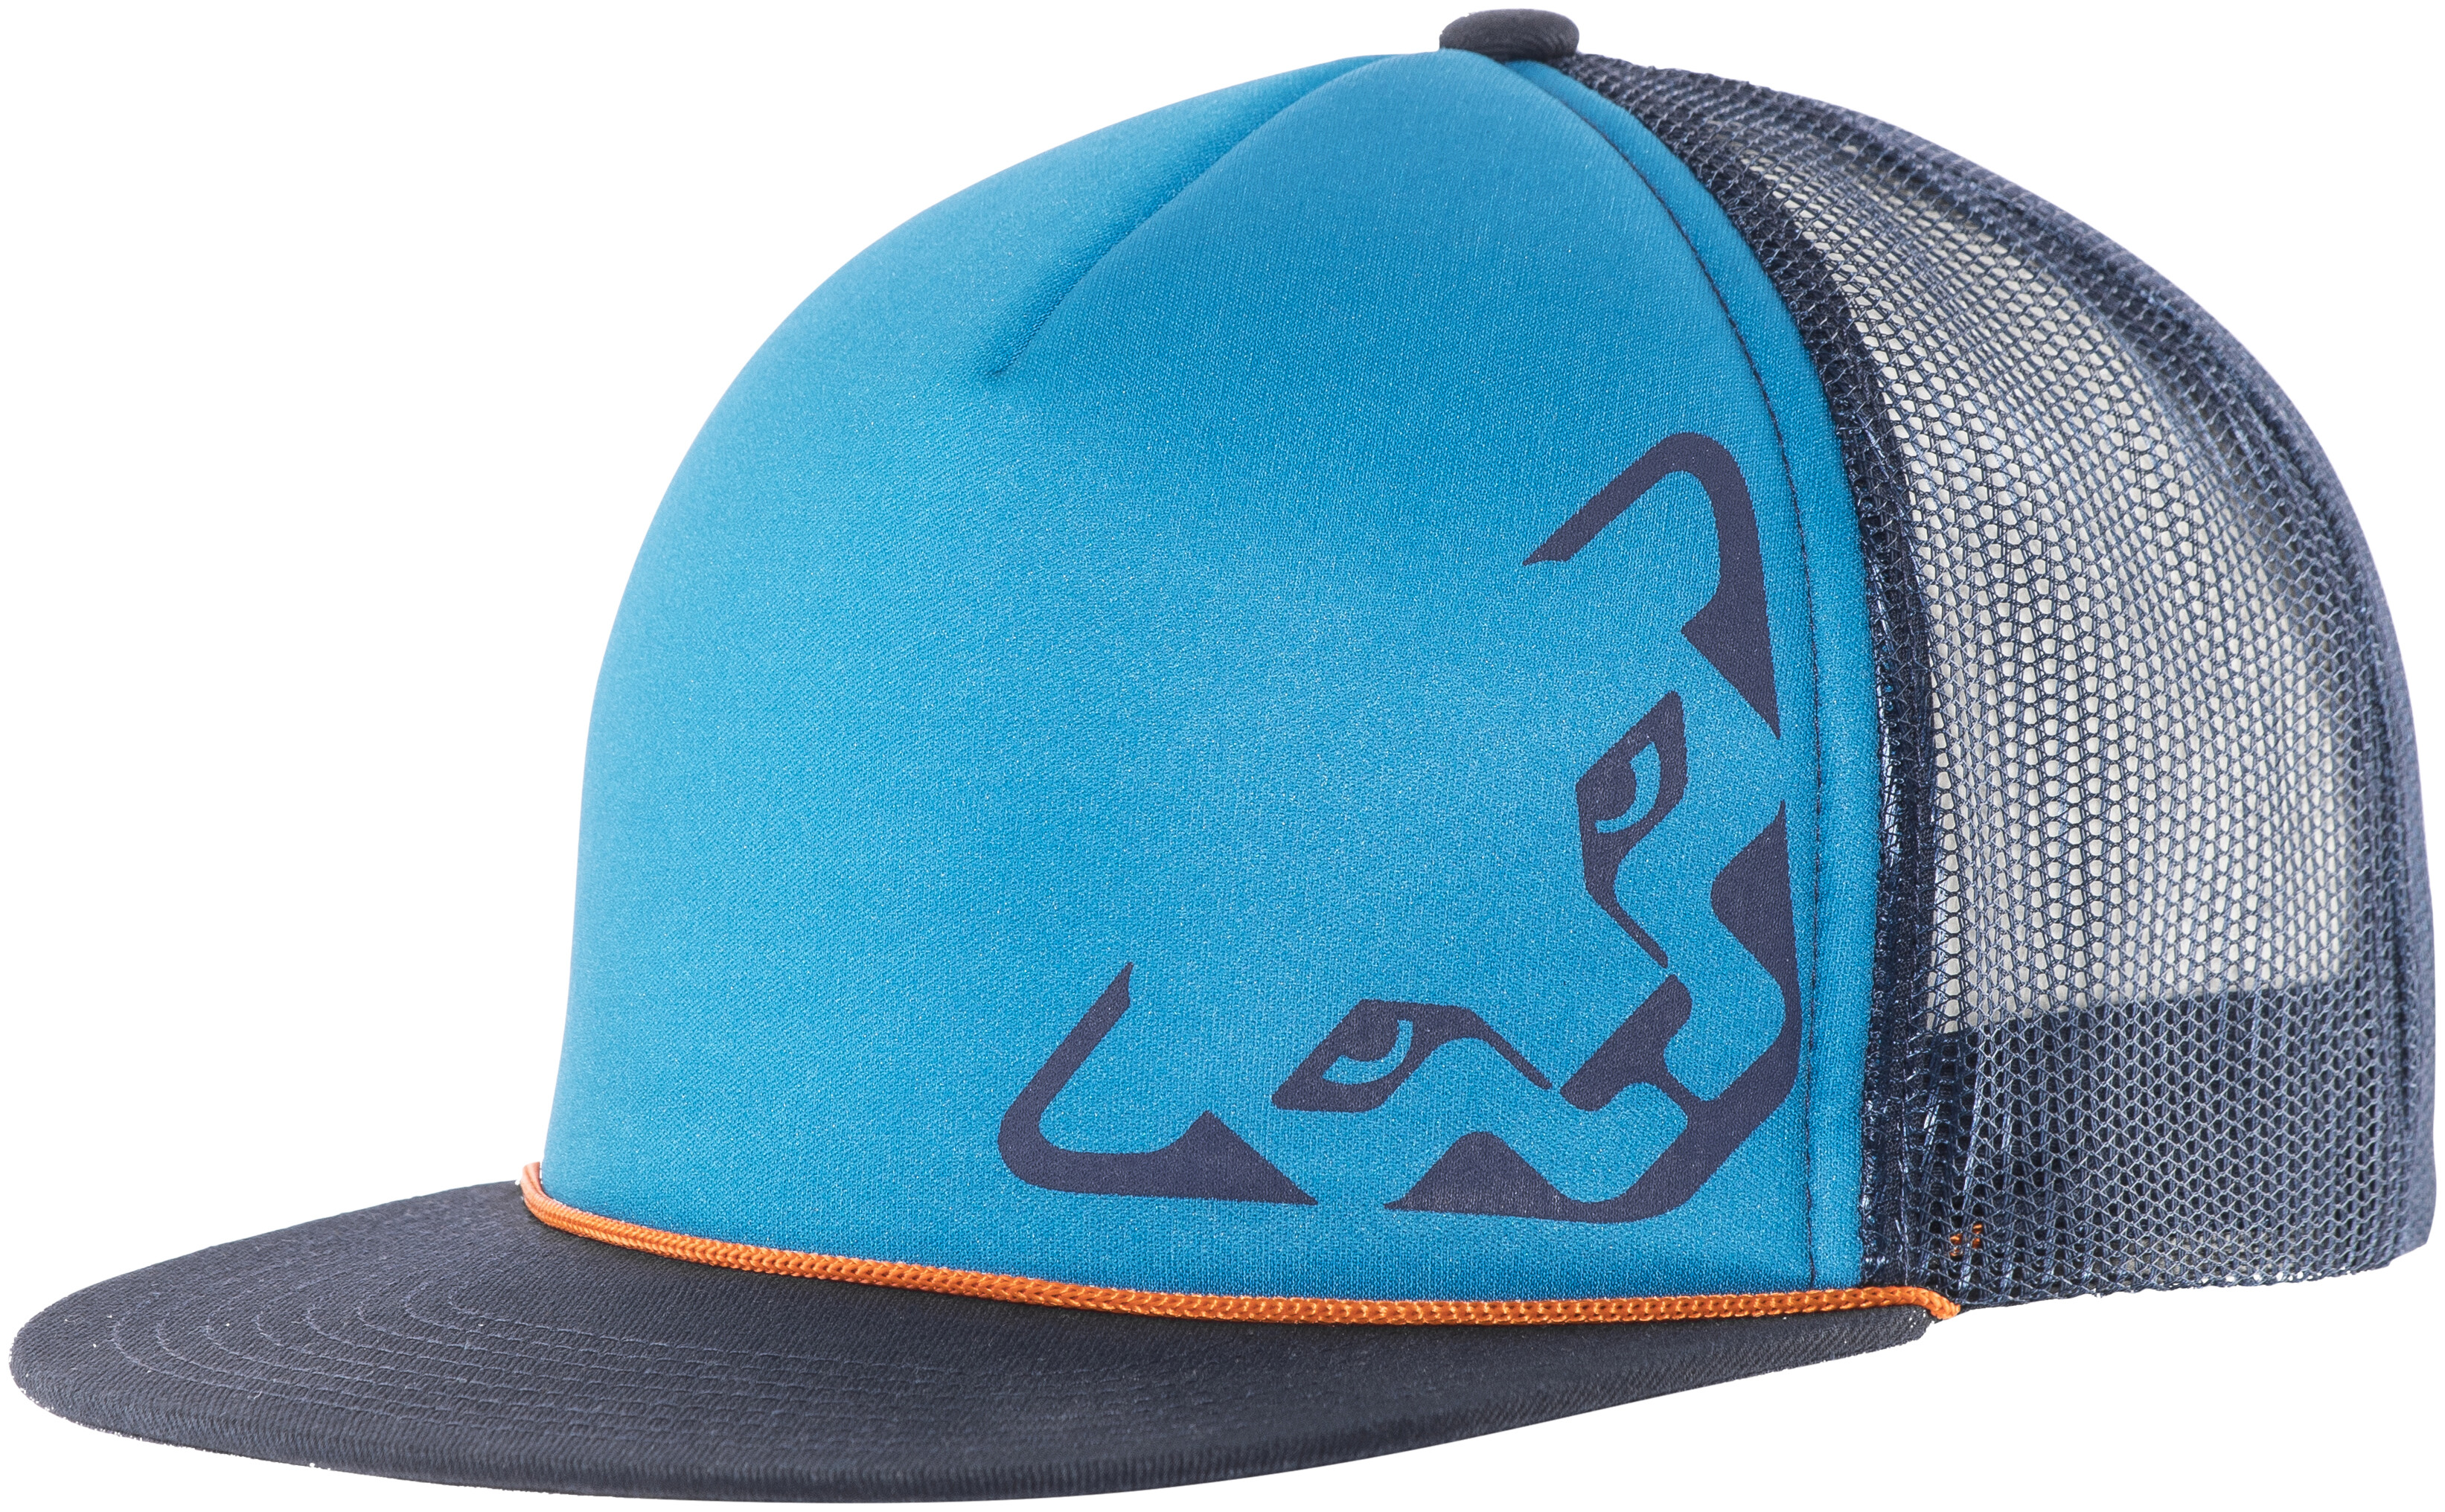 dynafit trucker 3 headwear blue  turquoise at addnature co uk